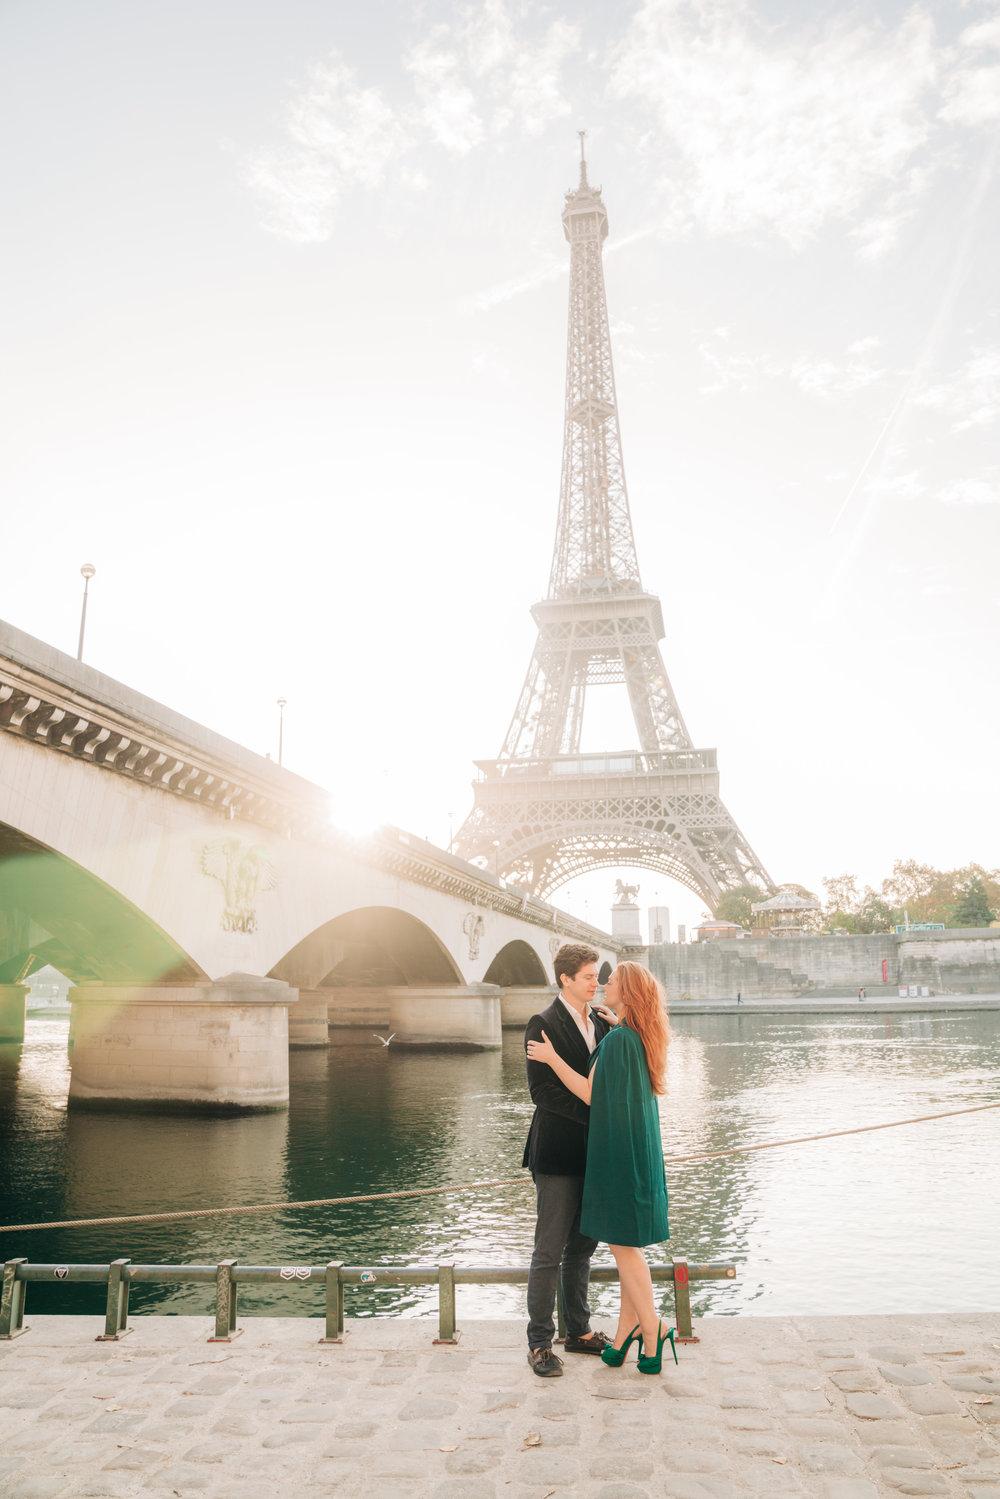 elegant honeymoon photo shoot at the eiffel tower in paris france